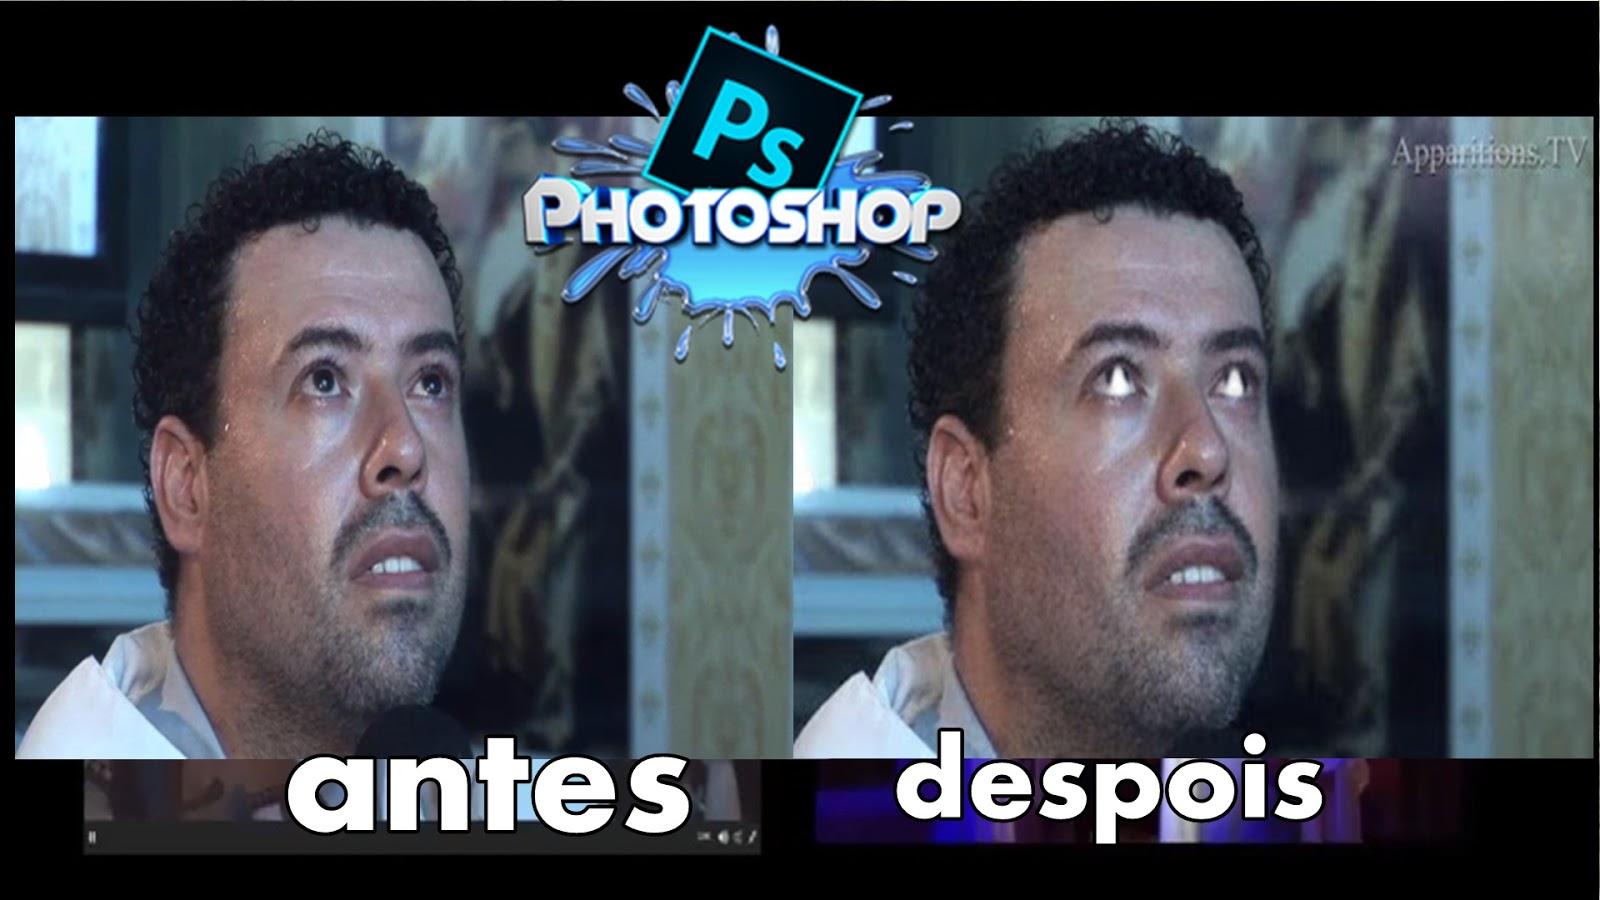 photoshop milagrosos